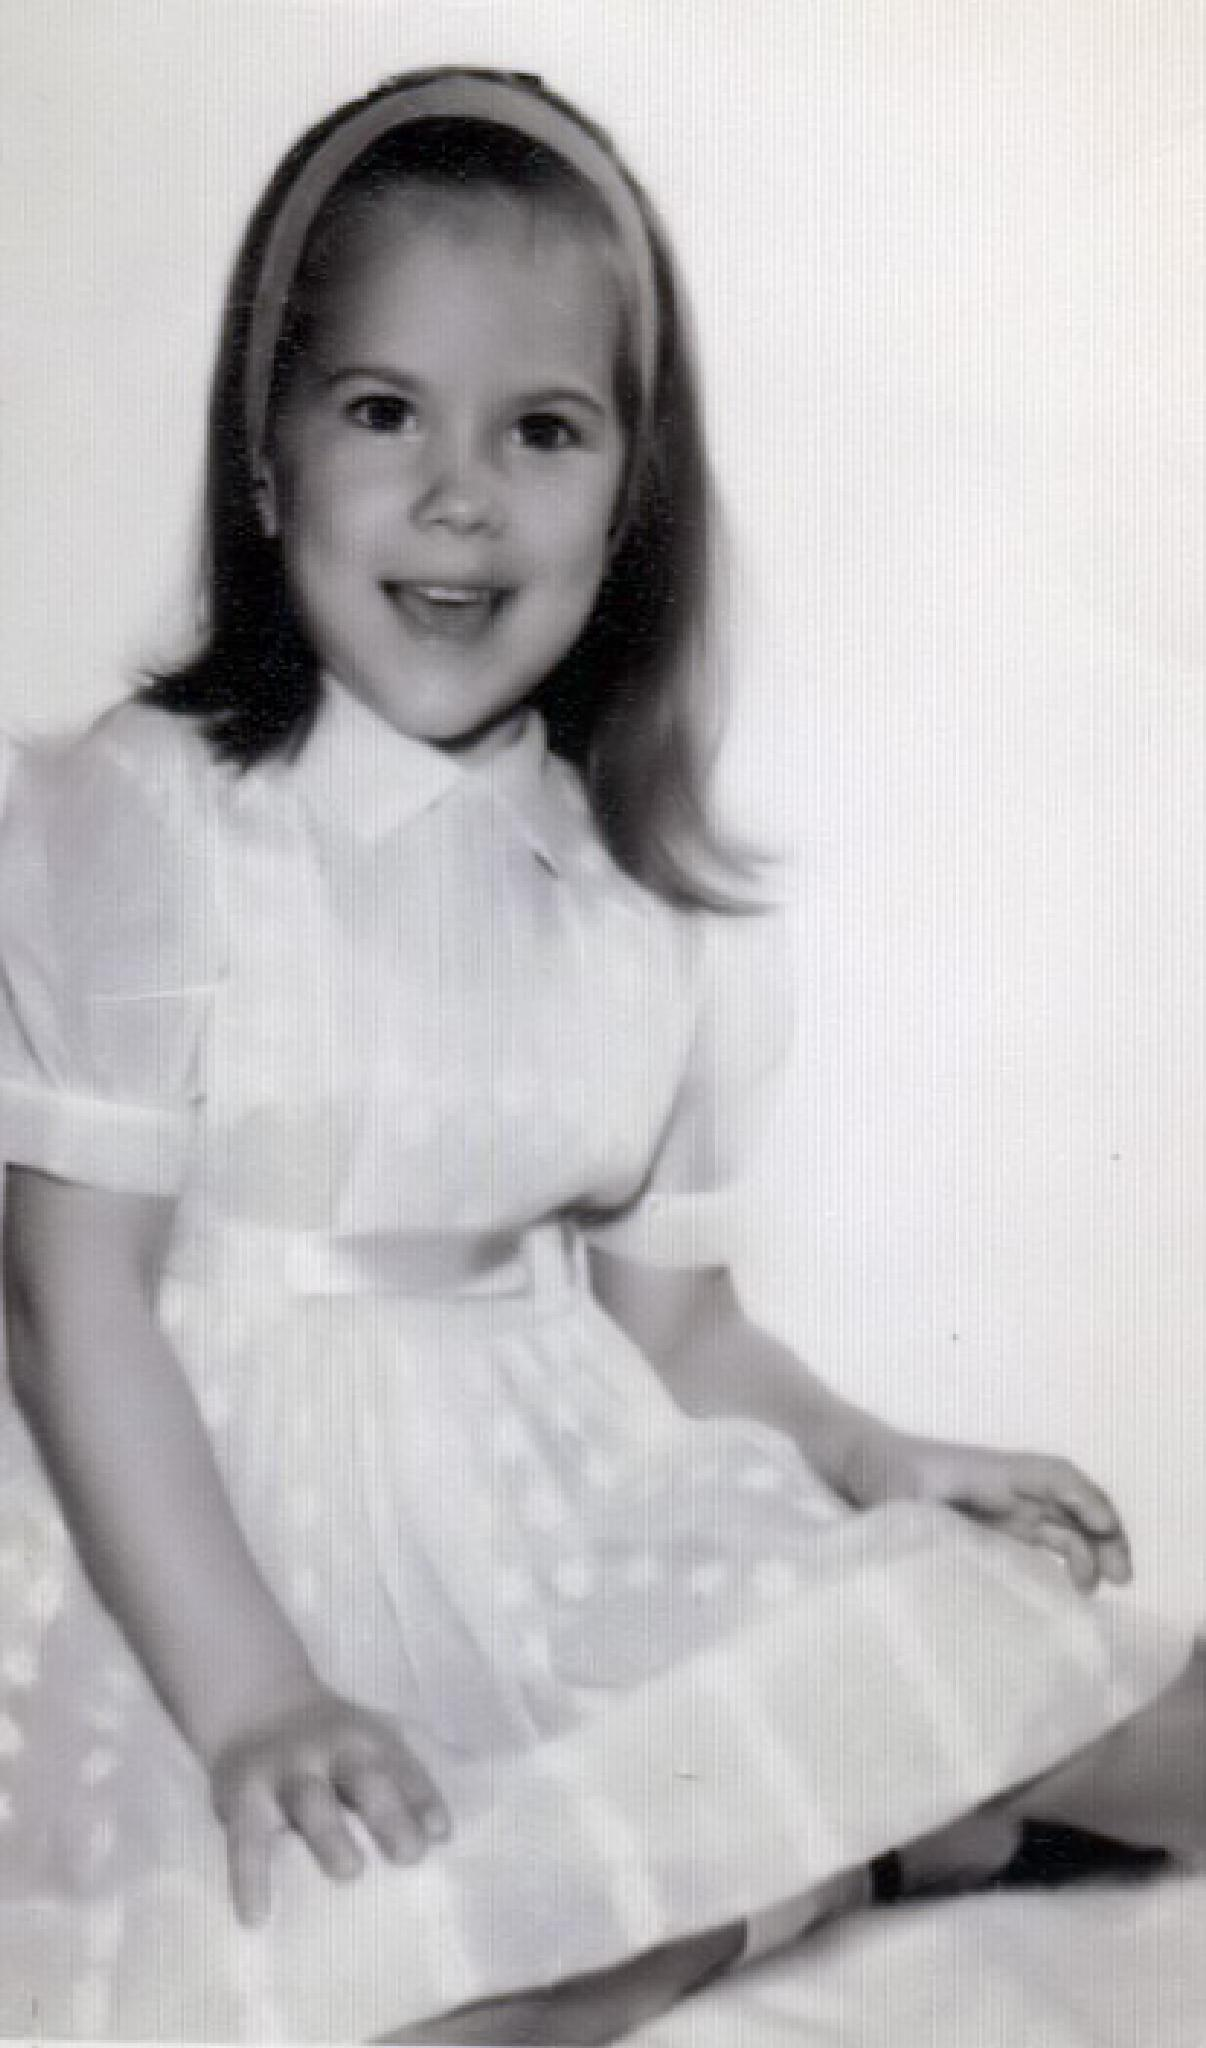 Linda at 4 years old or so. by linda.forgiarini